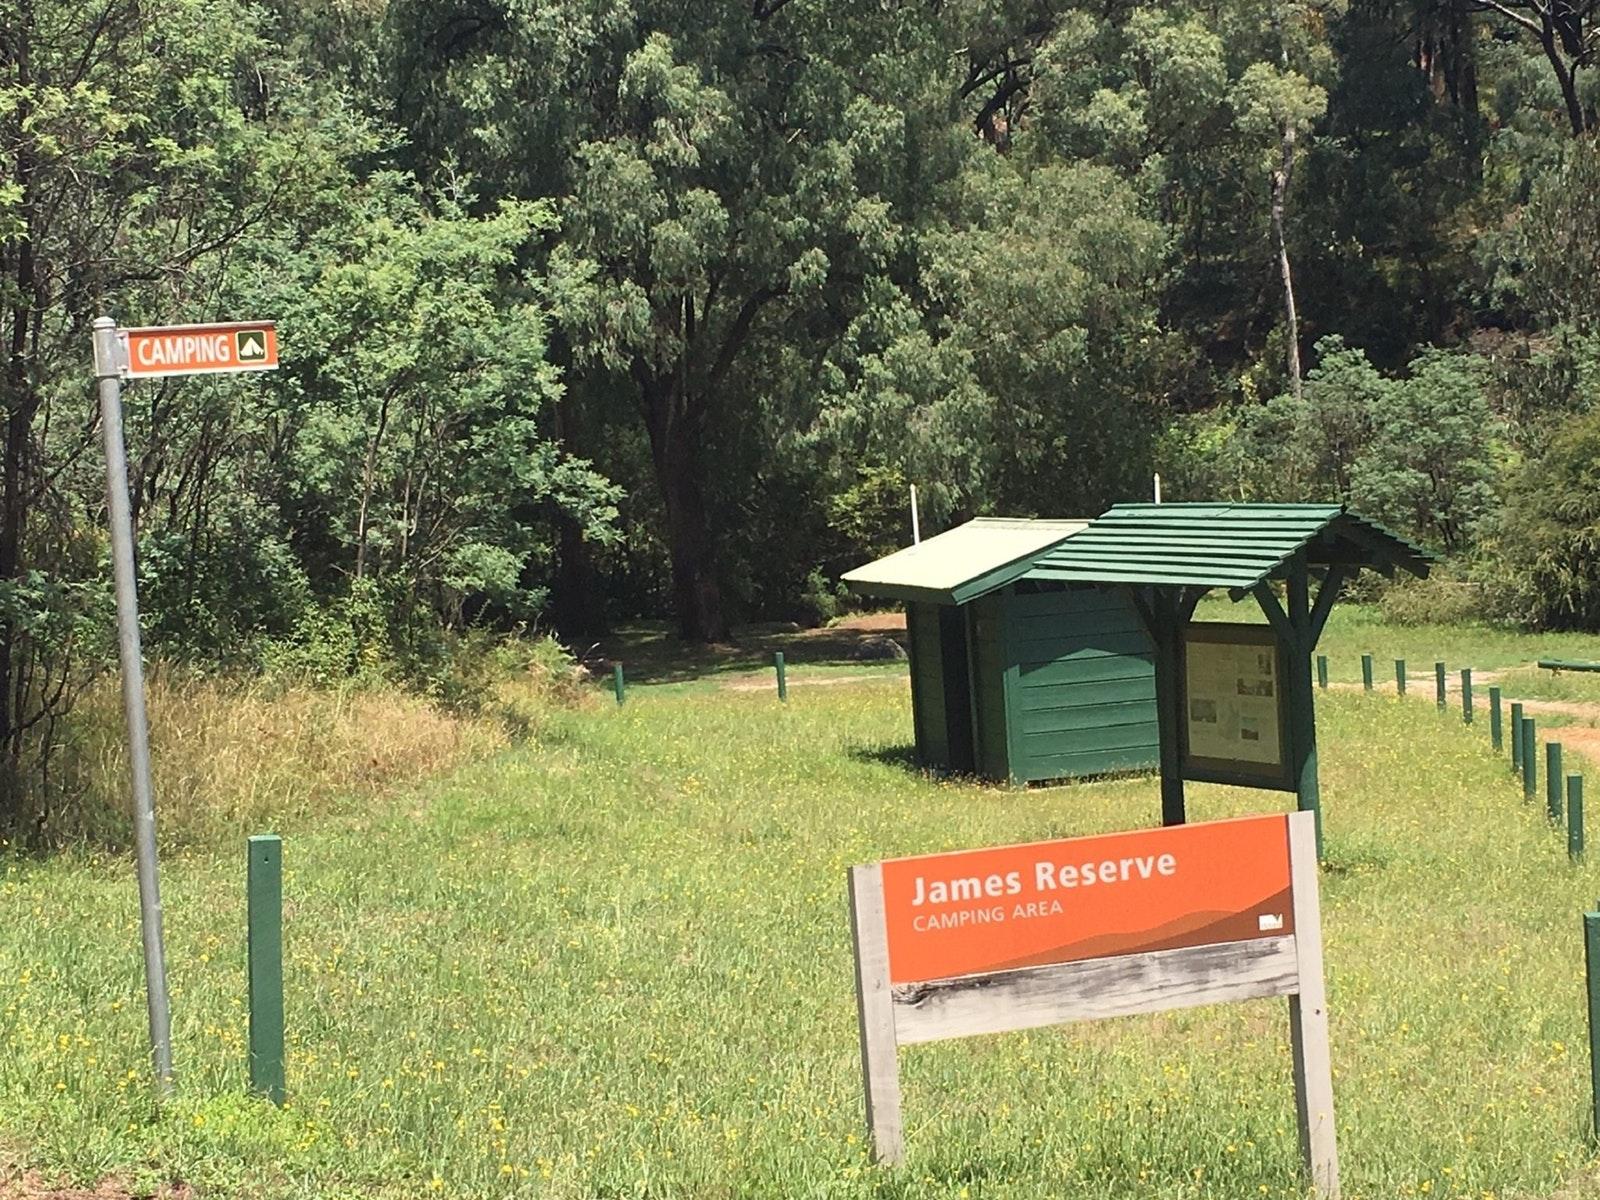 James Reserve